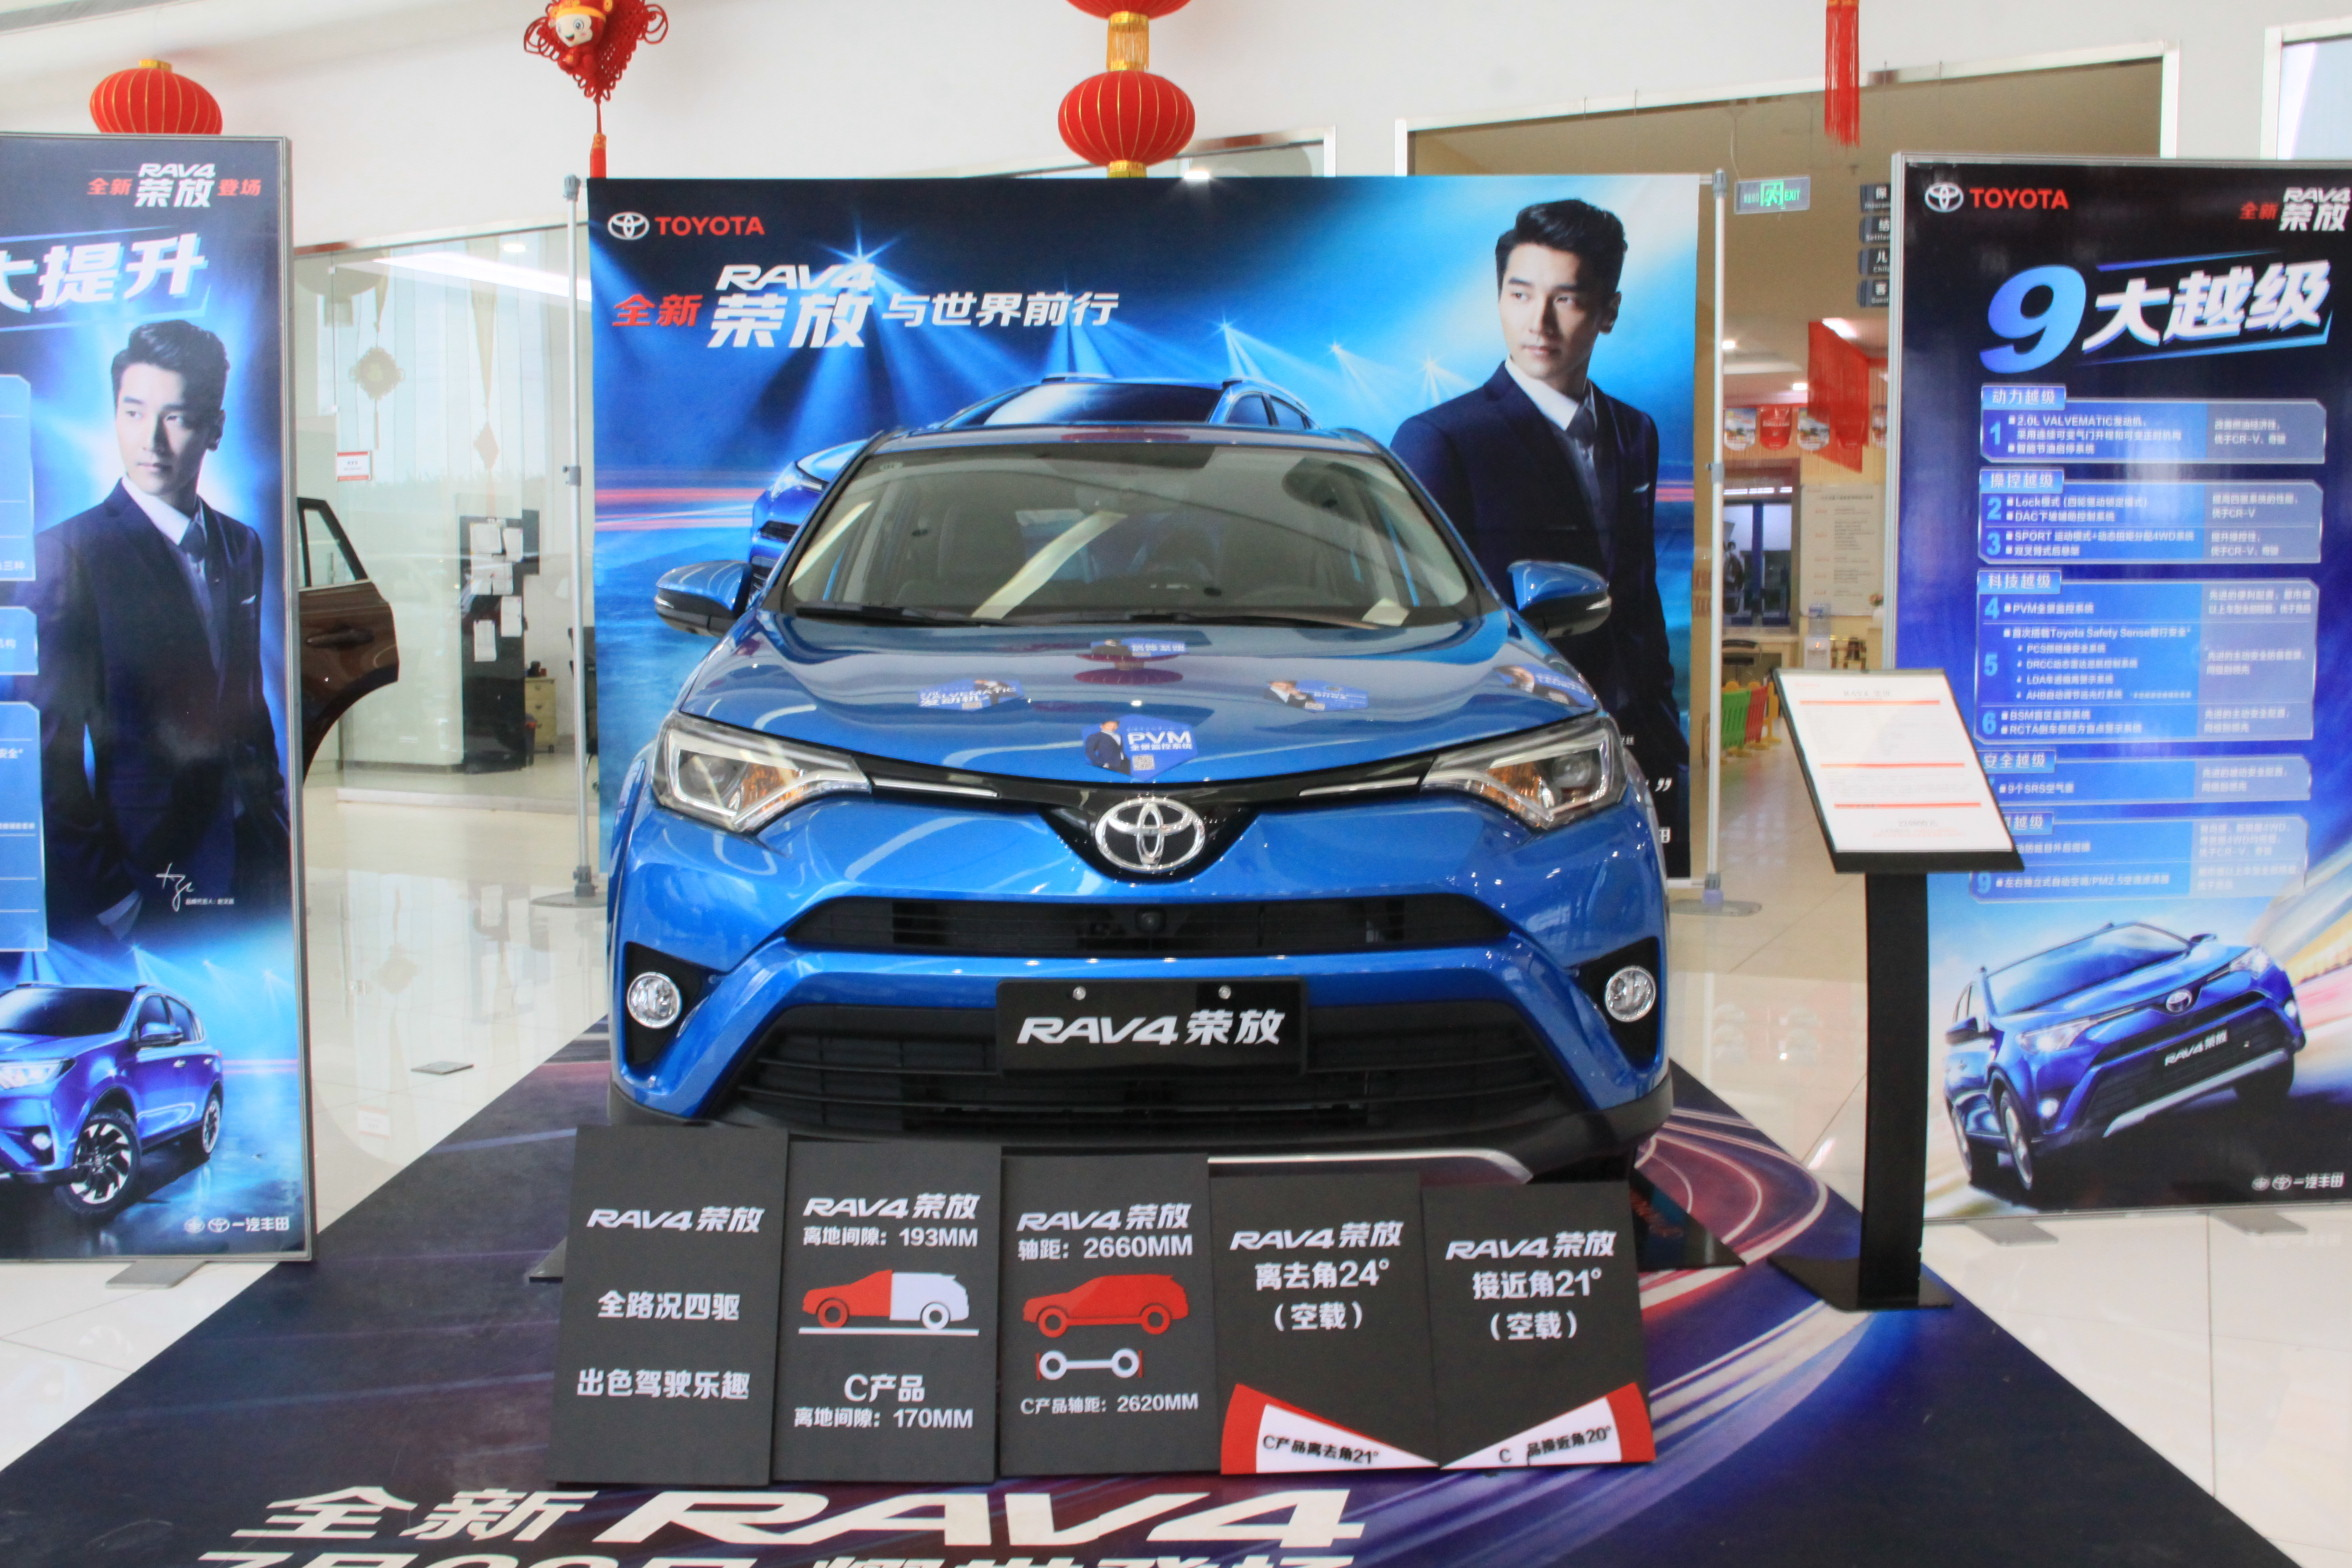 http://newcar.xcar.com.cn/wulumuqi/201608/news_1949150_1.html